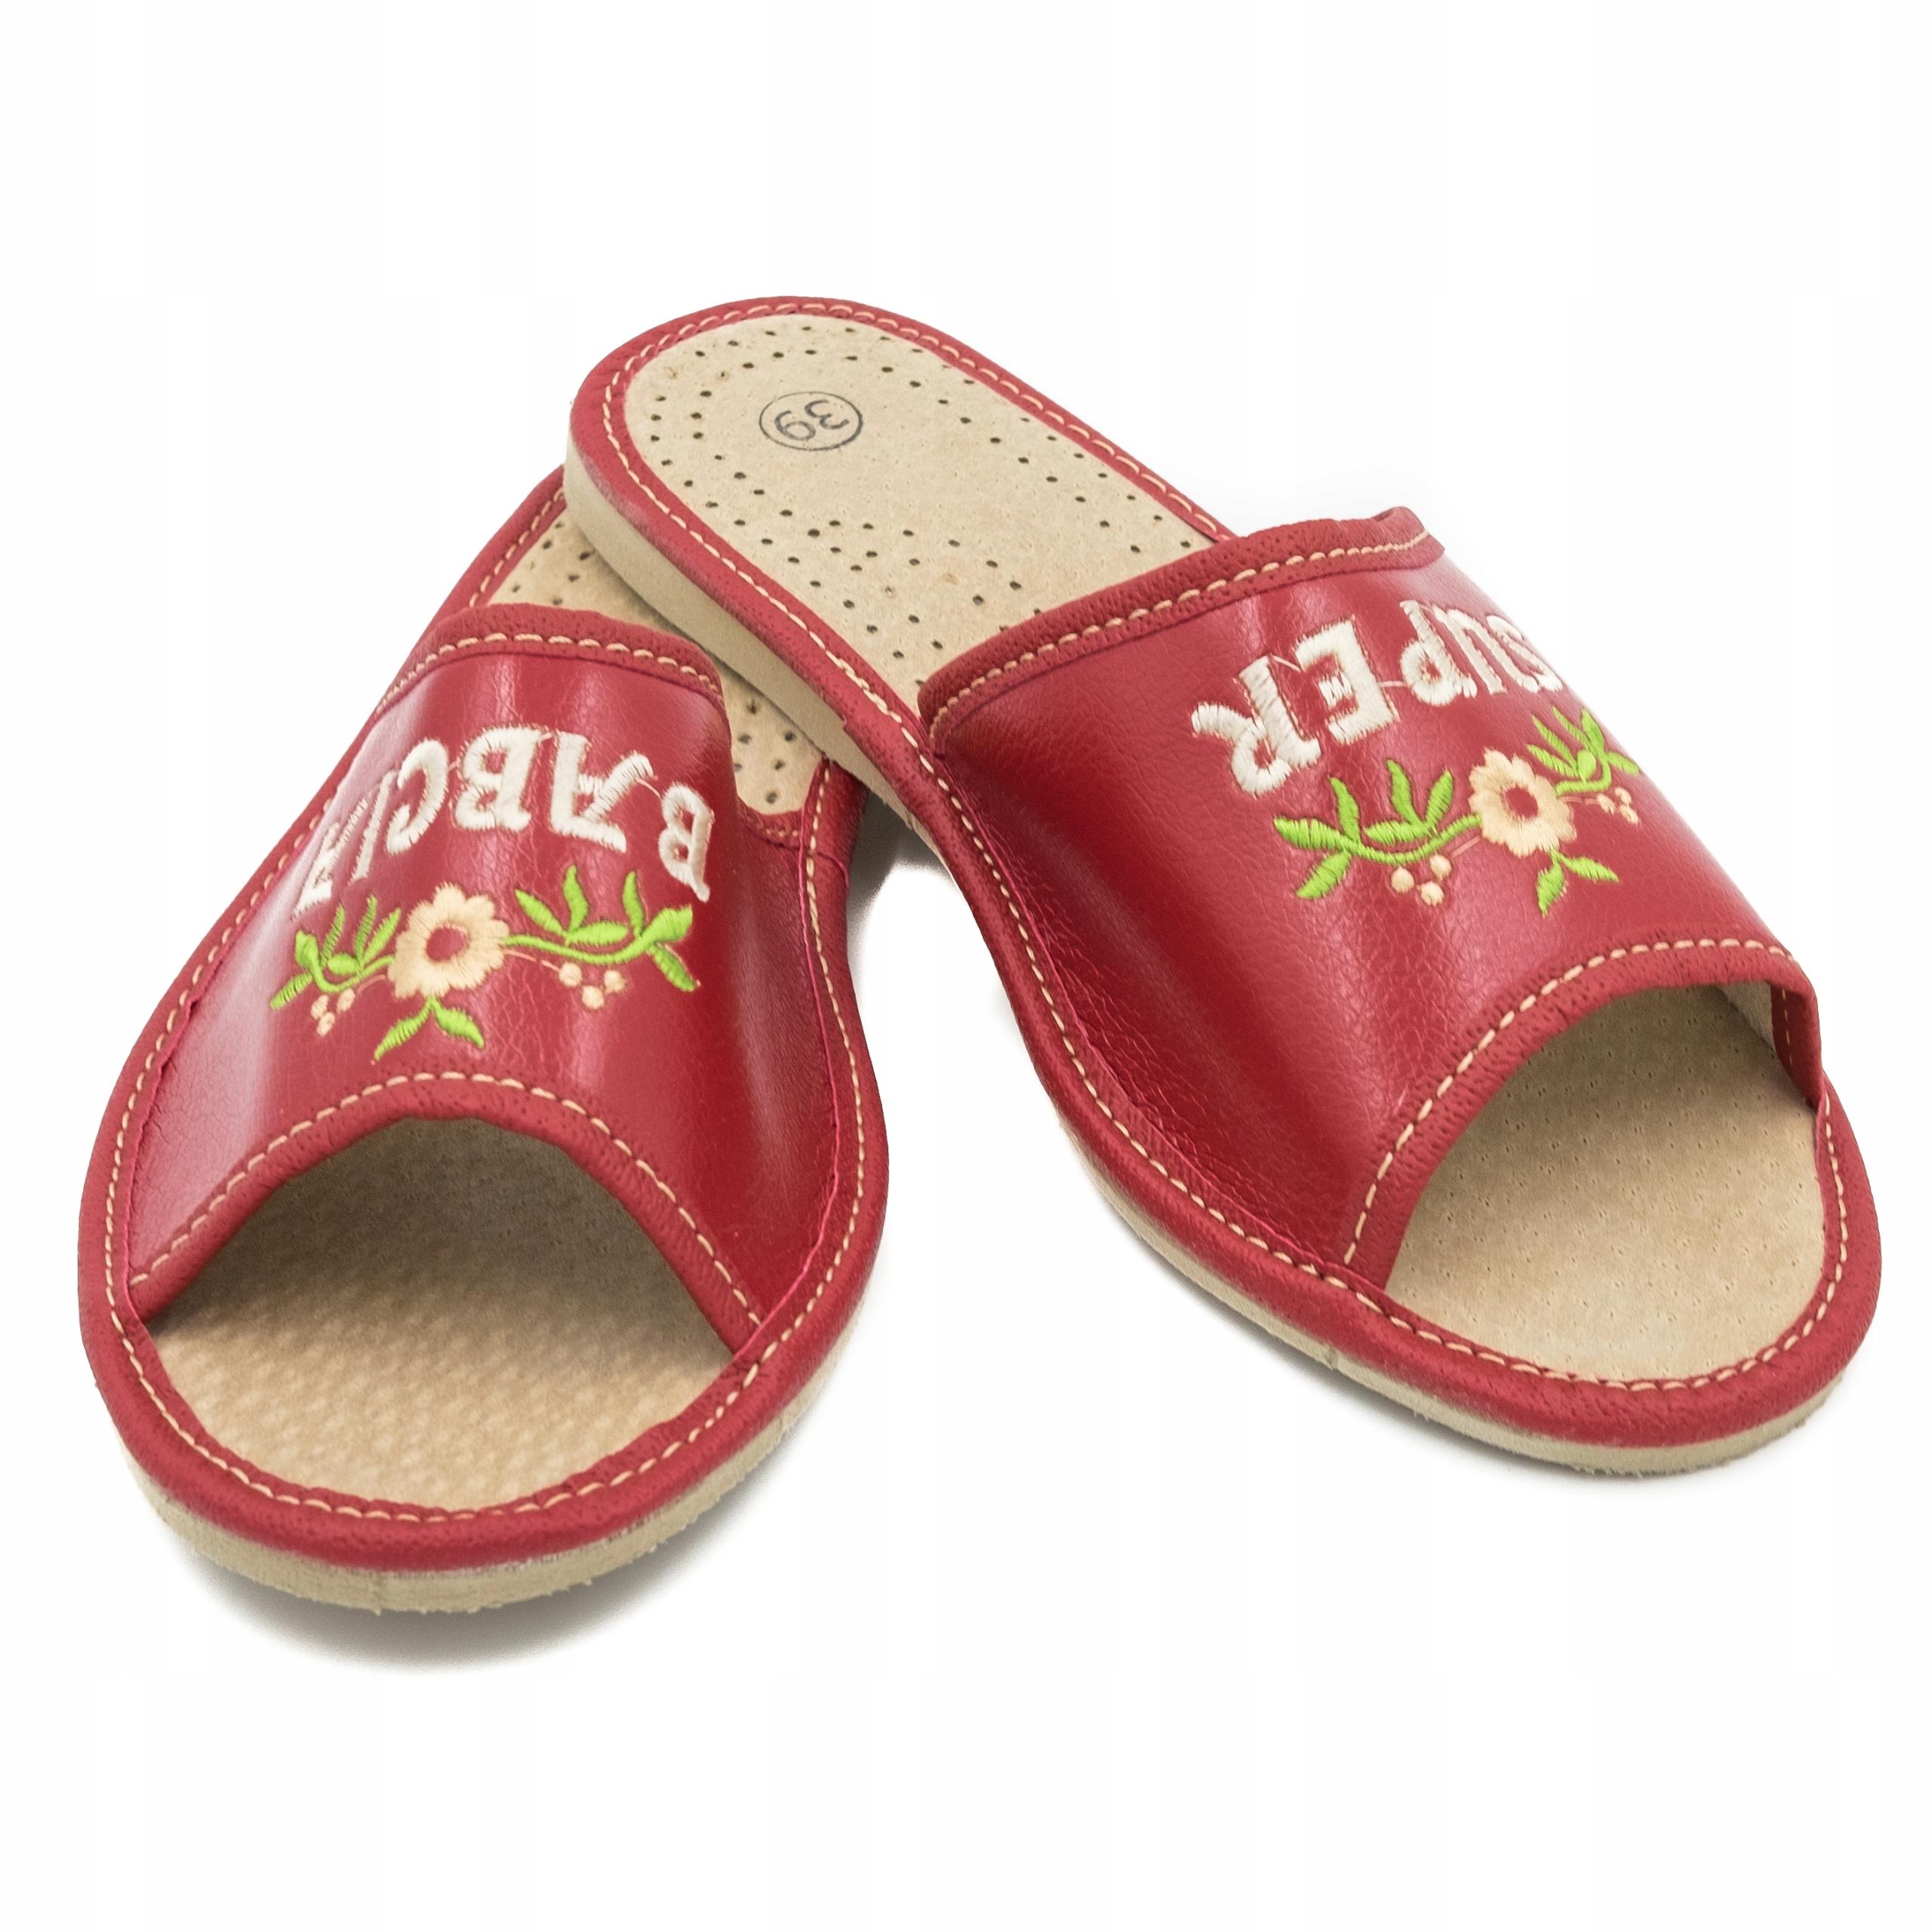 Комфортные кожаные тапочки Супер бабушка Тапочки 38